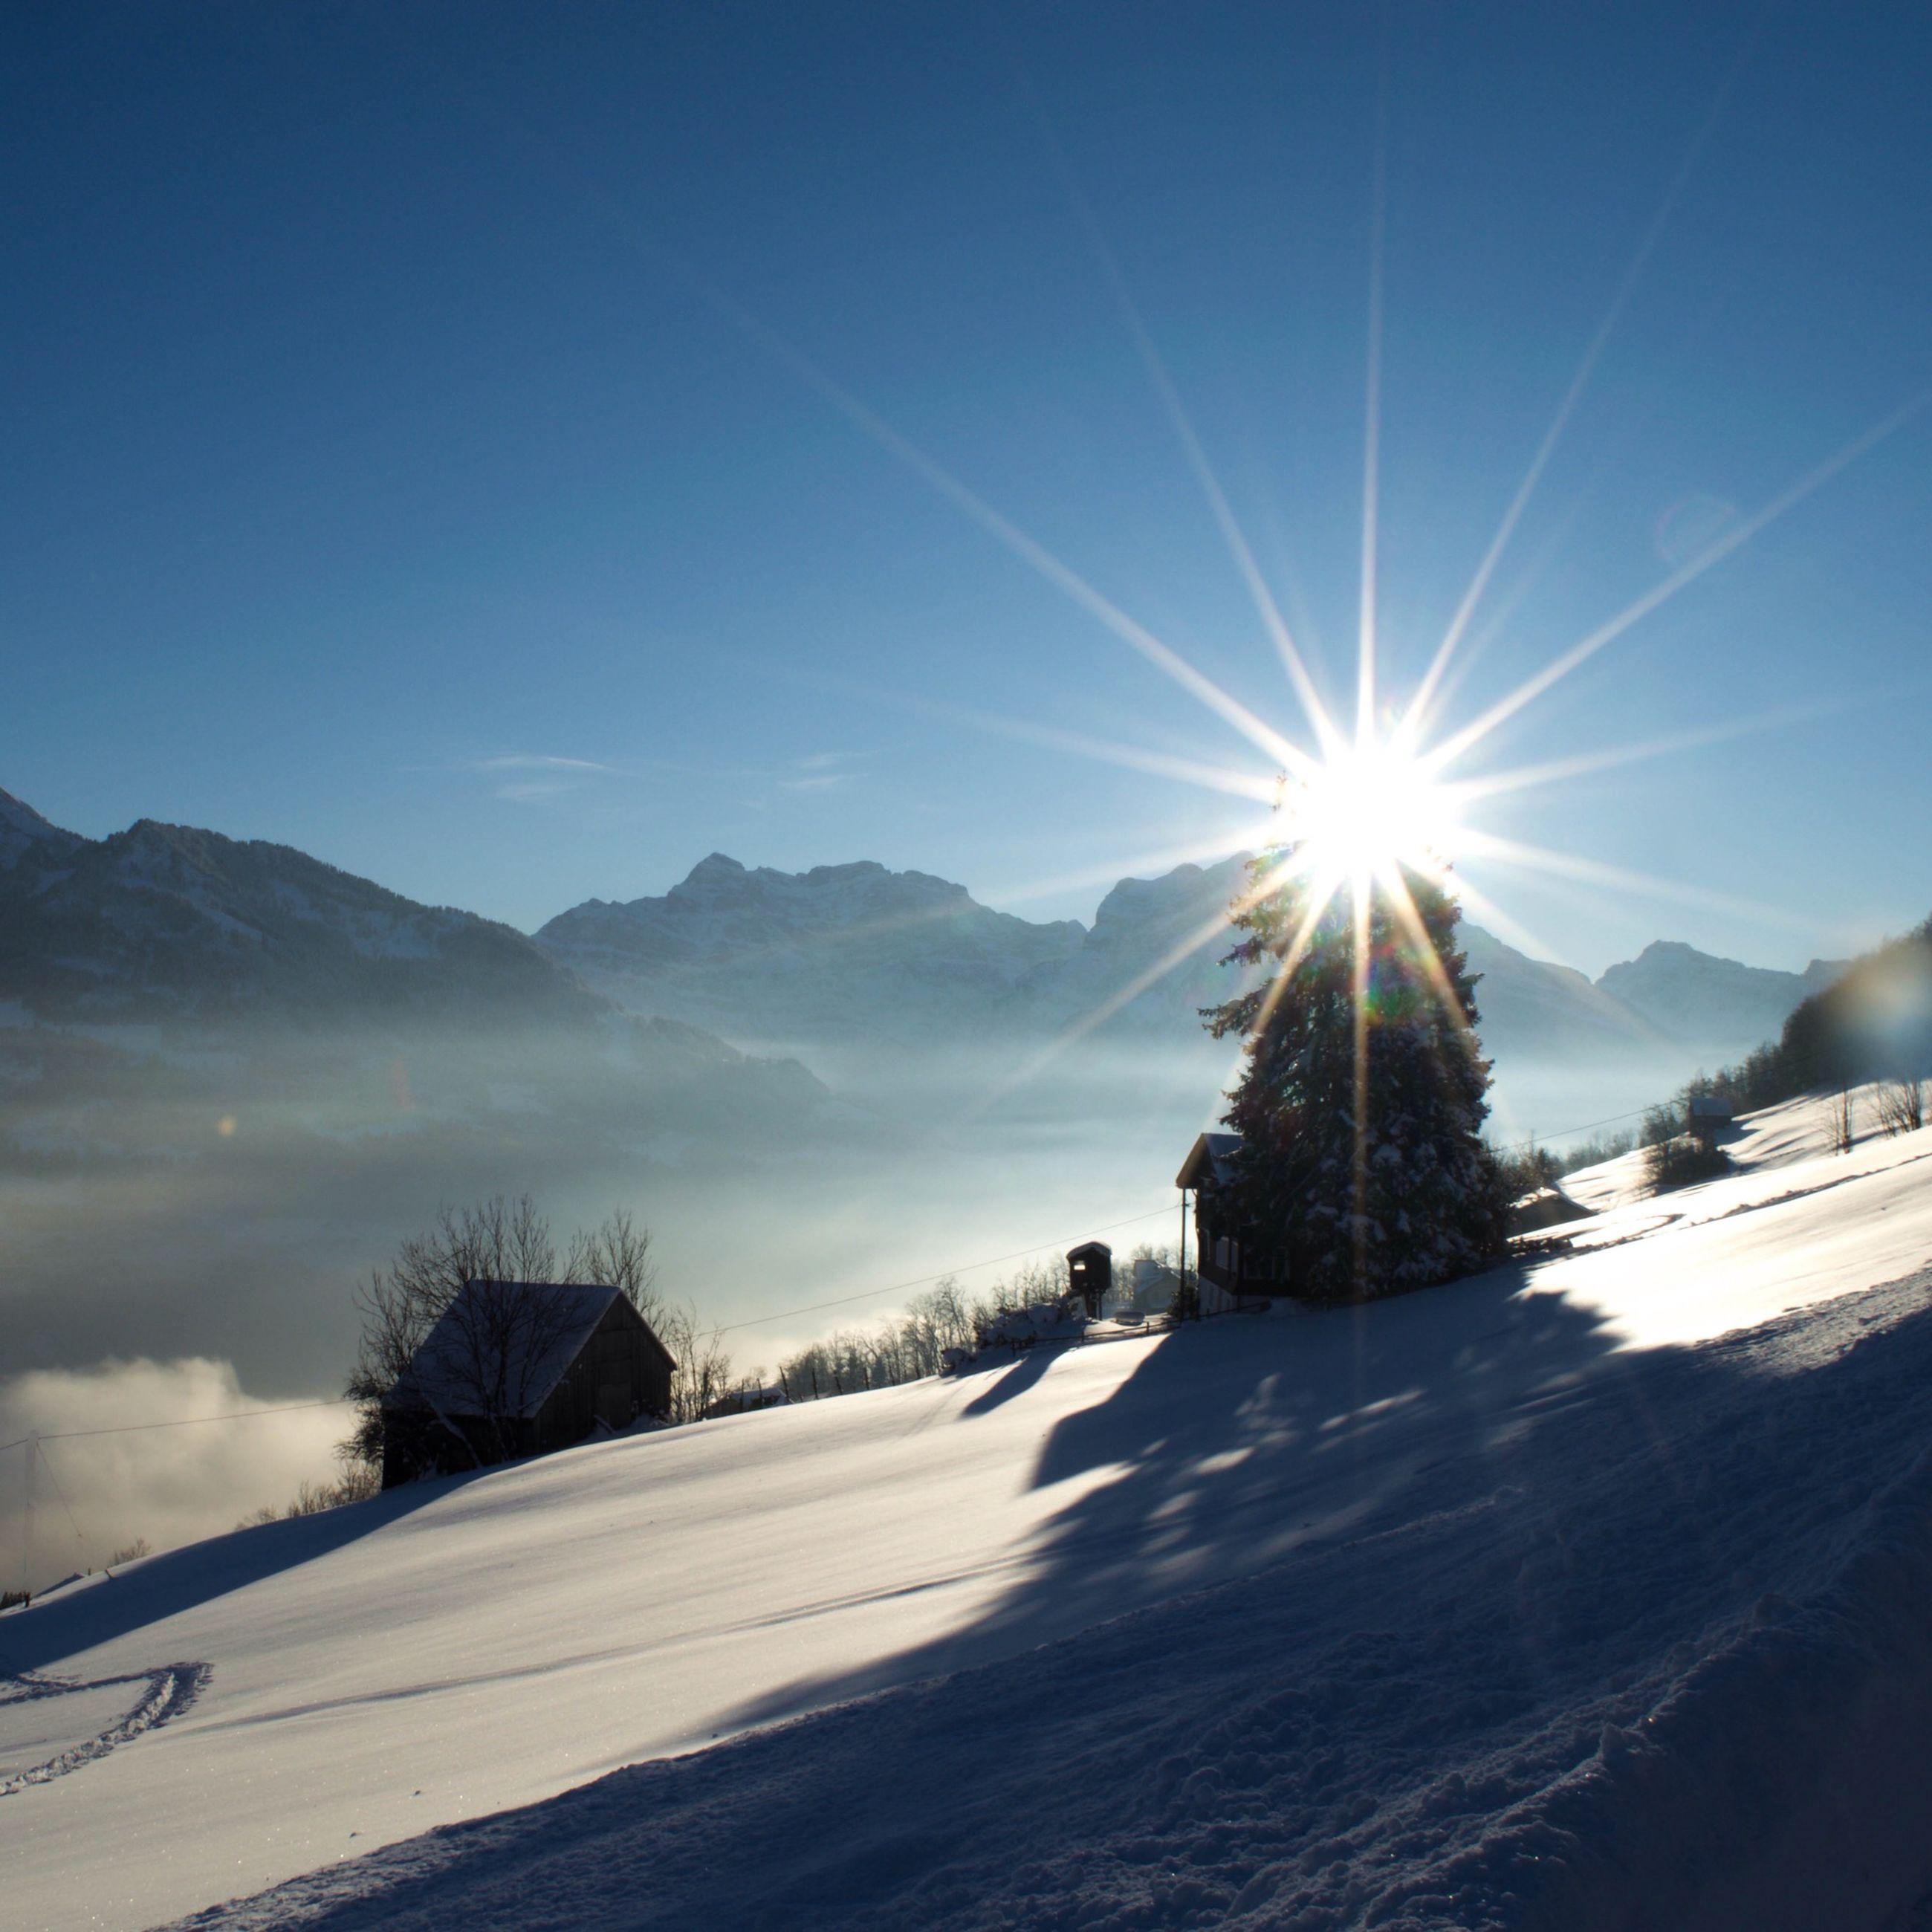 snow, sun, winter, cold temperature, sunbeam, sunlight, mountain, landscape, lens flare, tranquil scene, tranquility, sky, scenics, nature, beauty in nature, mountain range, season, sunny, snowcapped mountain, blue